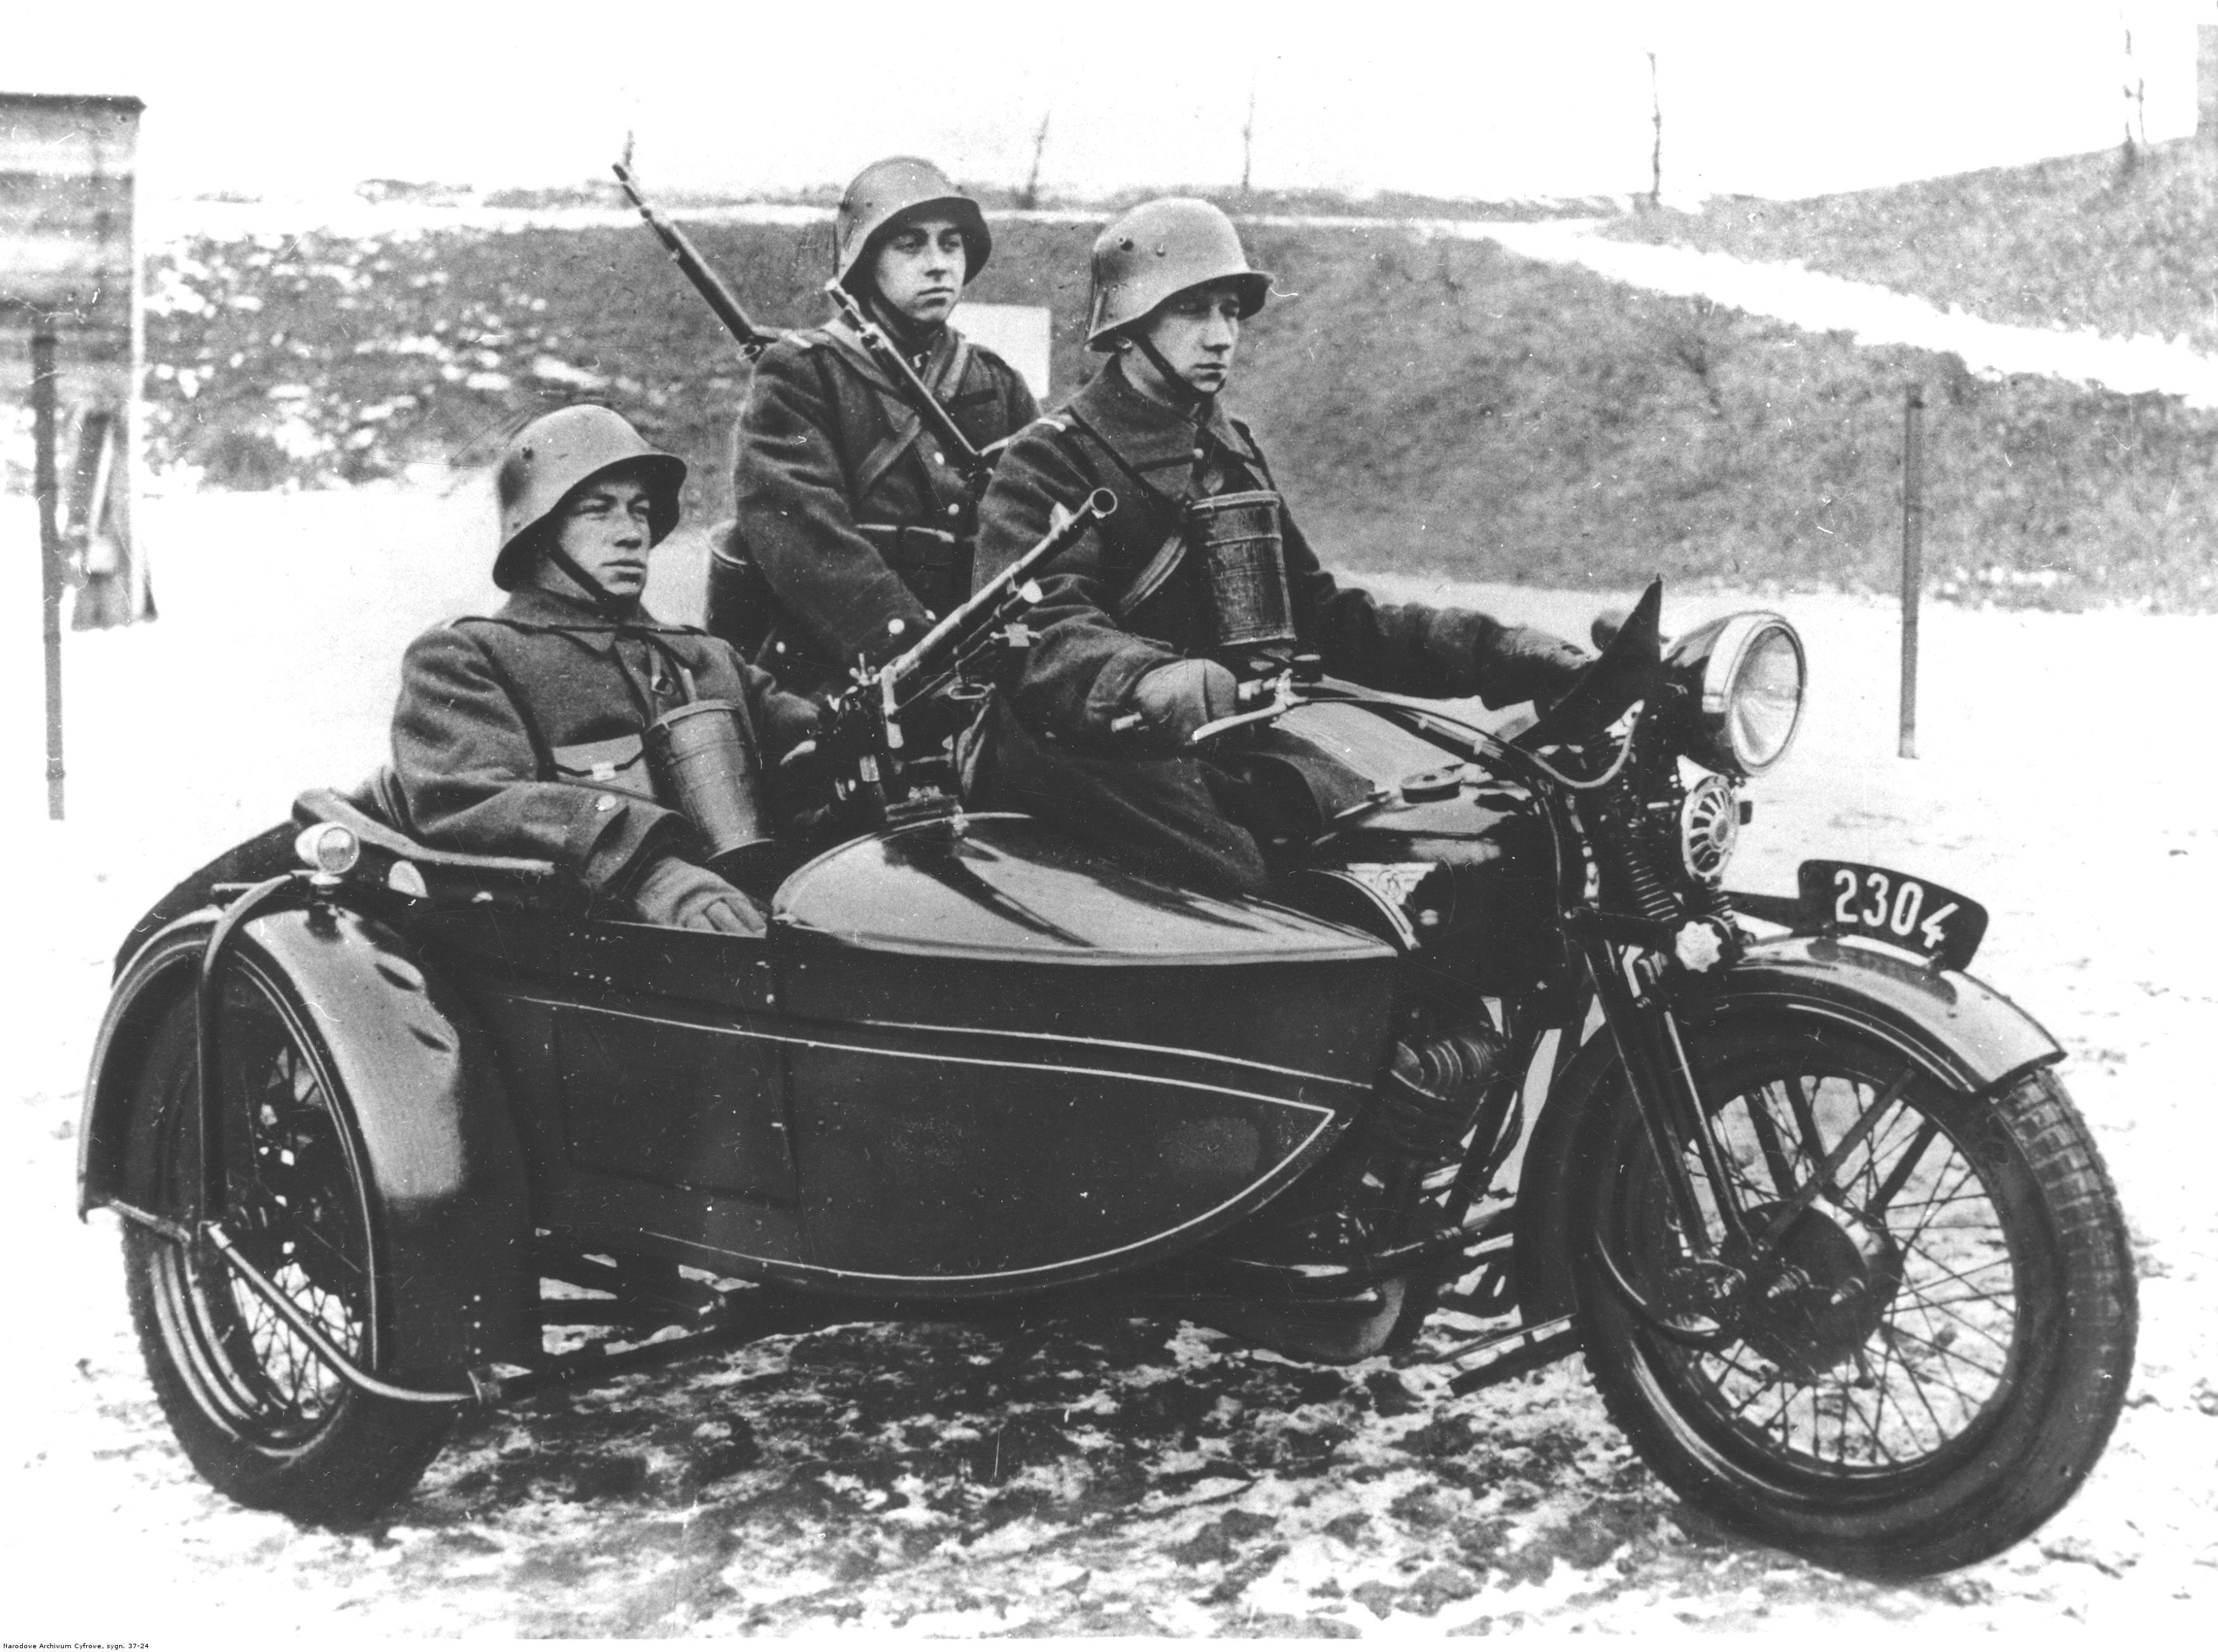 PIC_37-24_01938_10th_Motorized_Cavalry_B